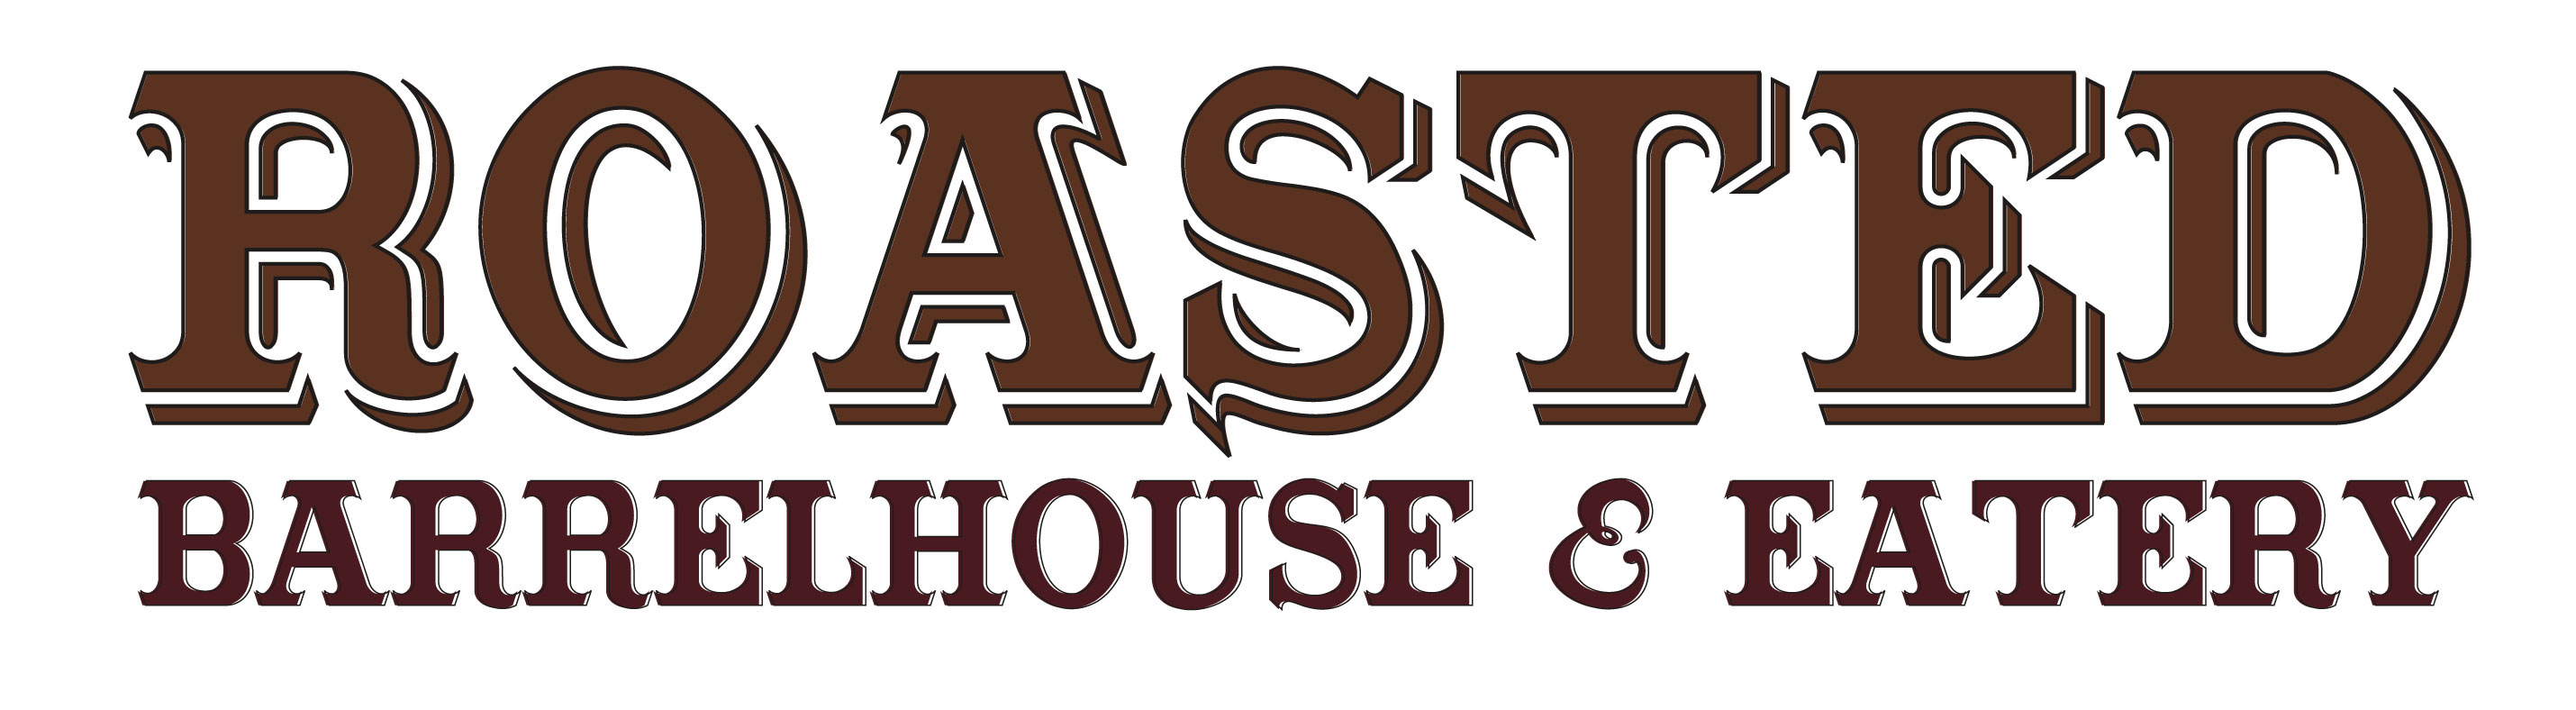 roasted-barrelhouse-logo